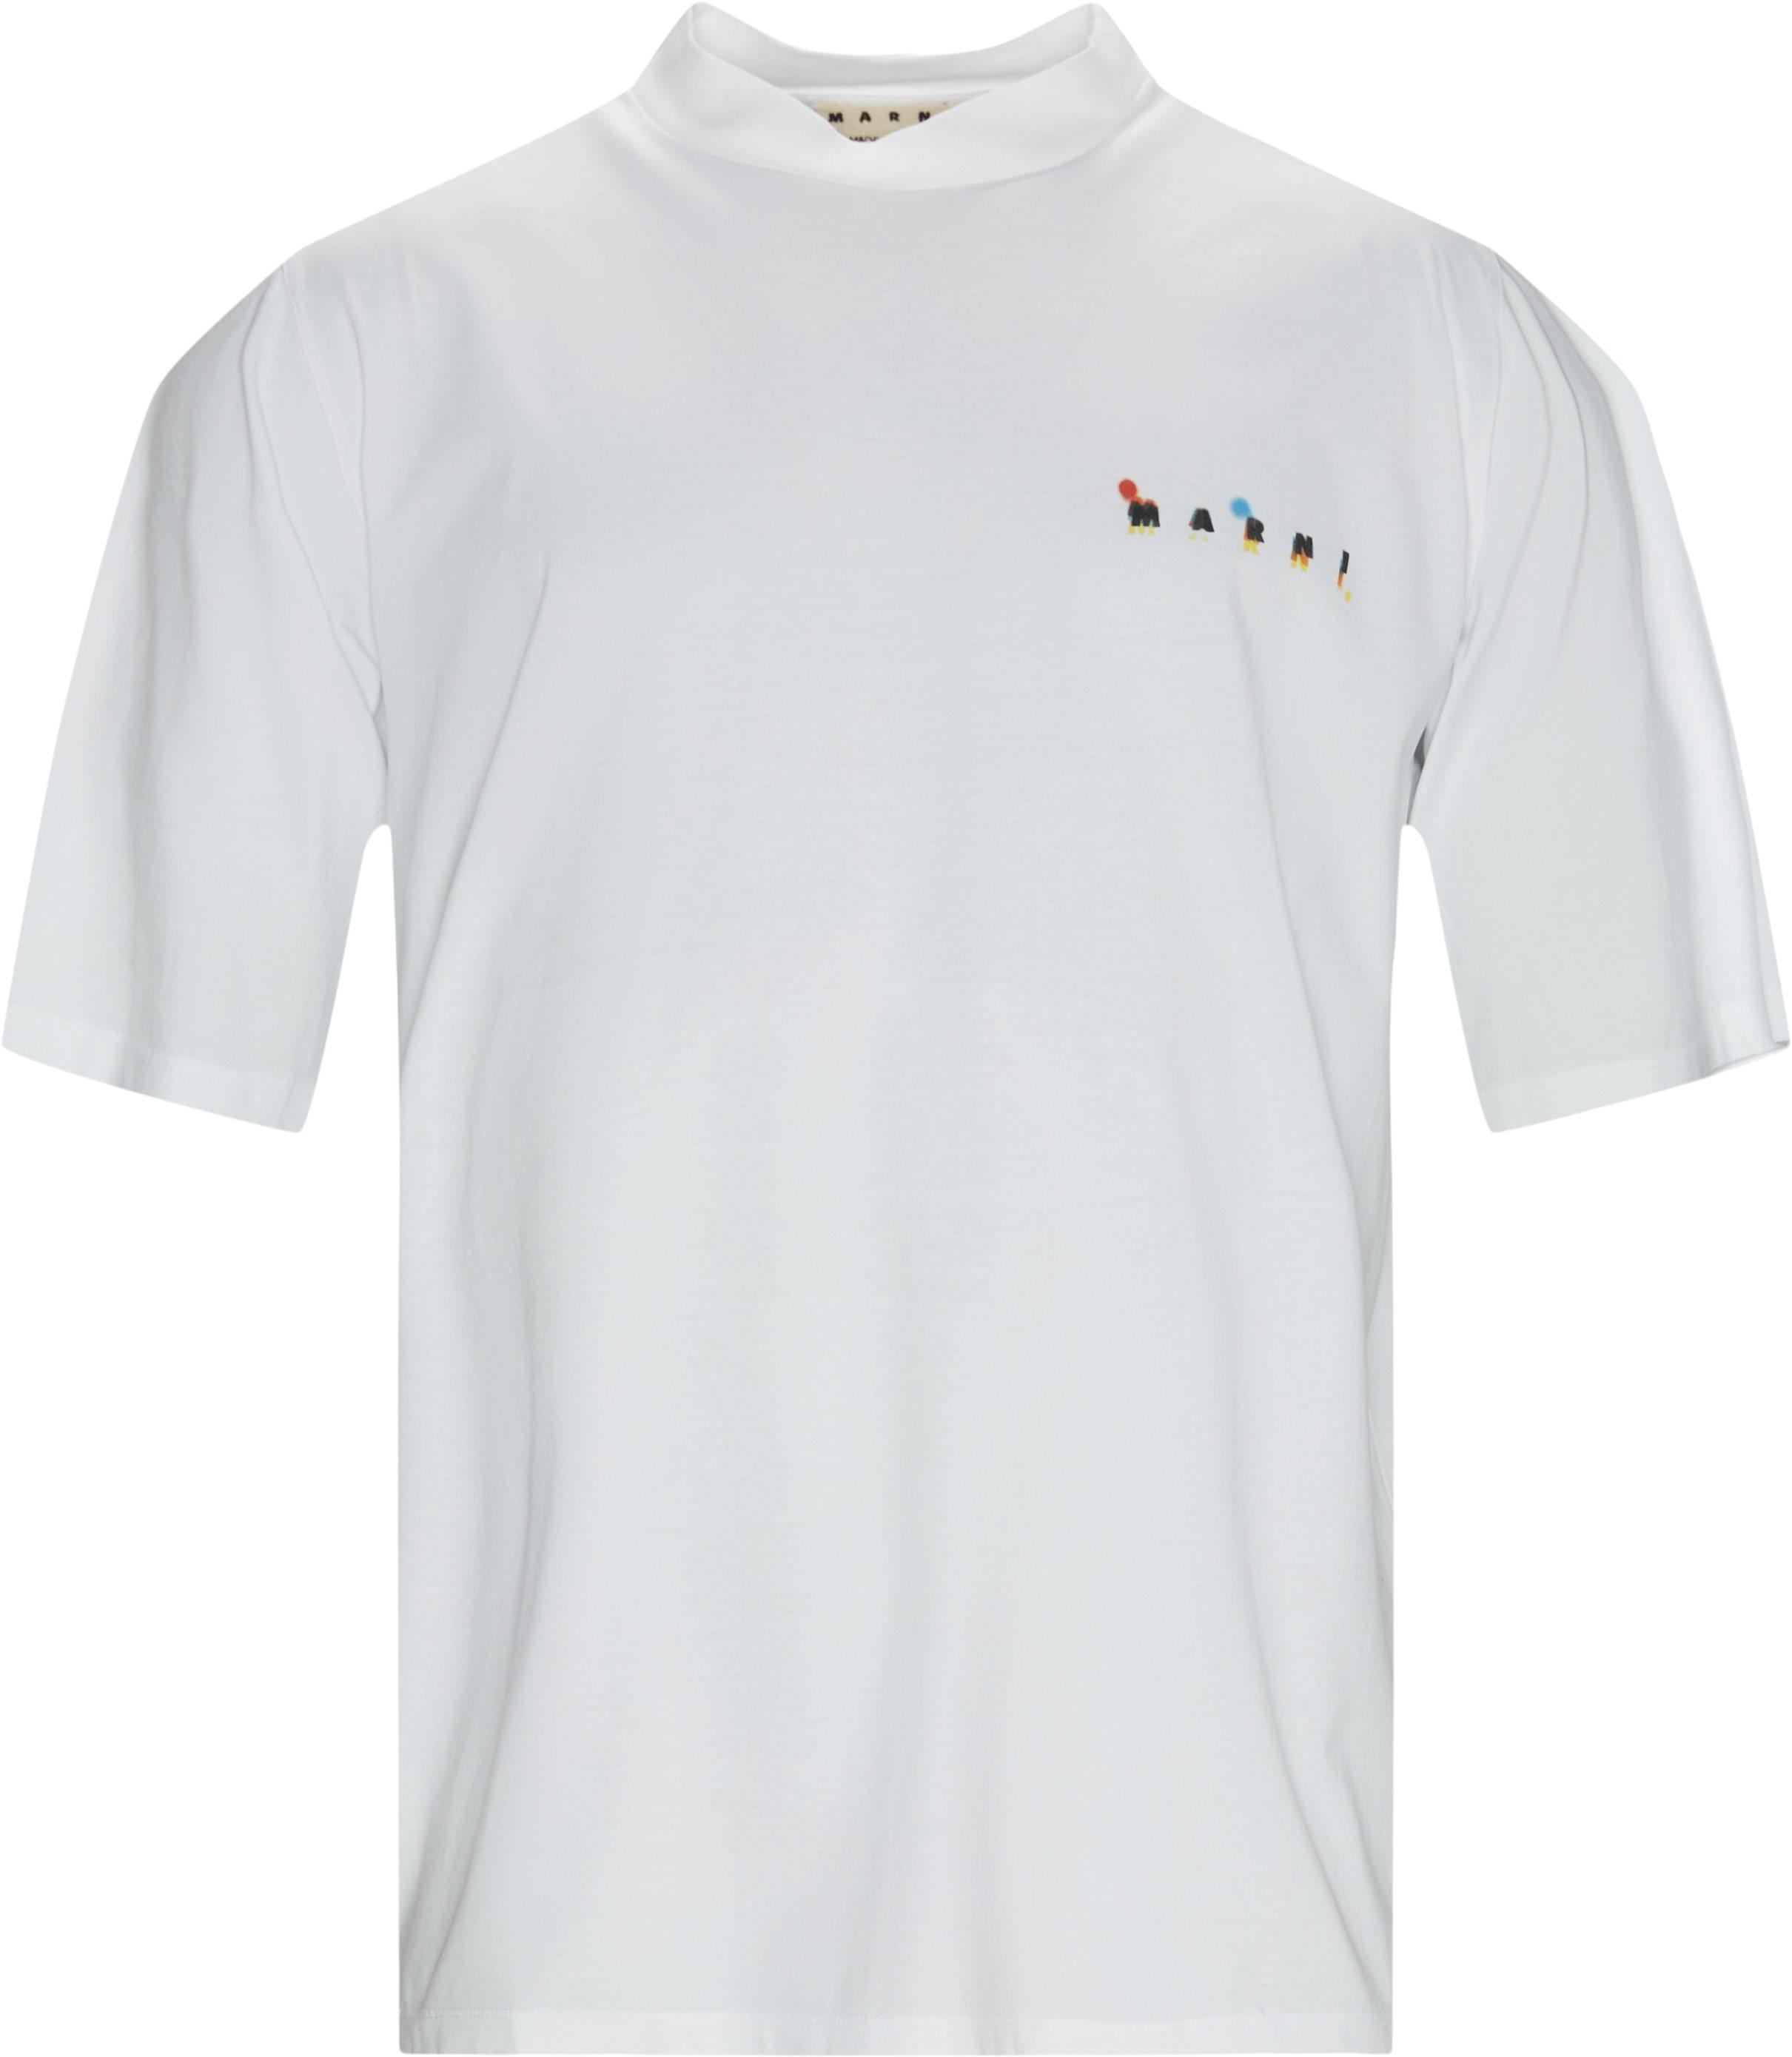 Spray Tee - T-shirts - Loose fit - Hvid